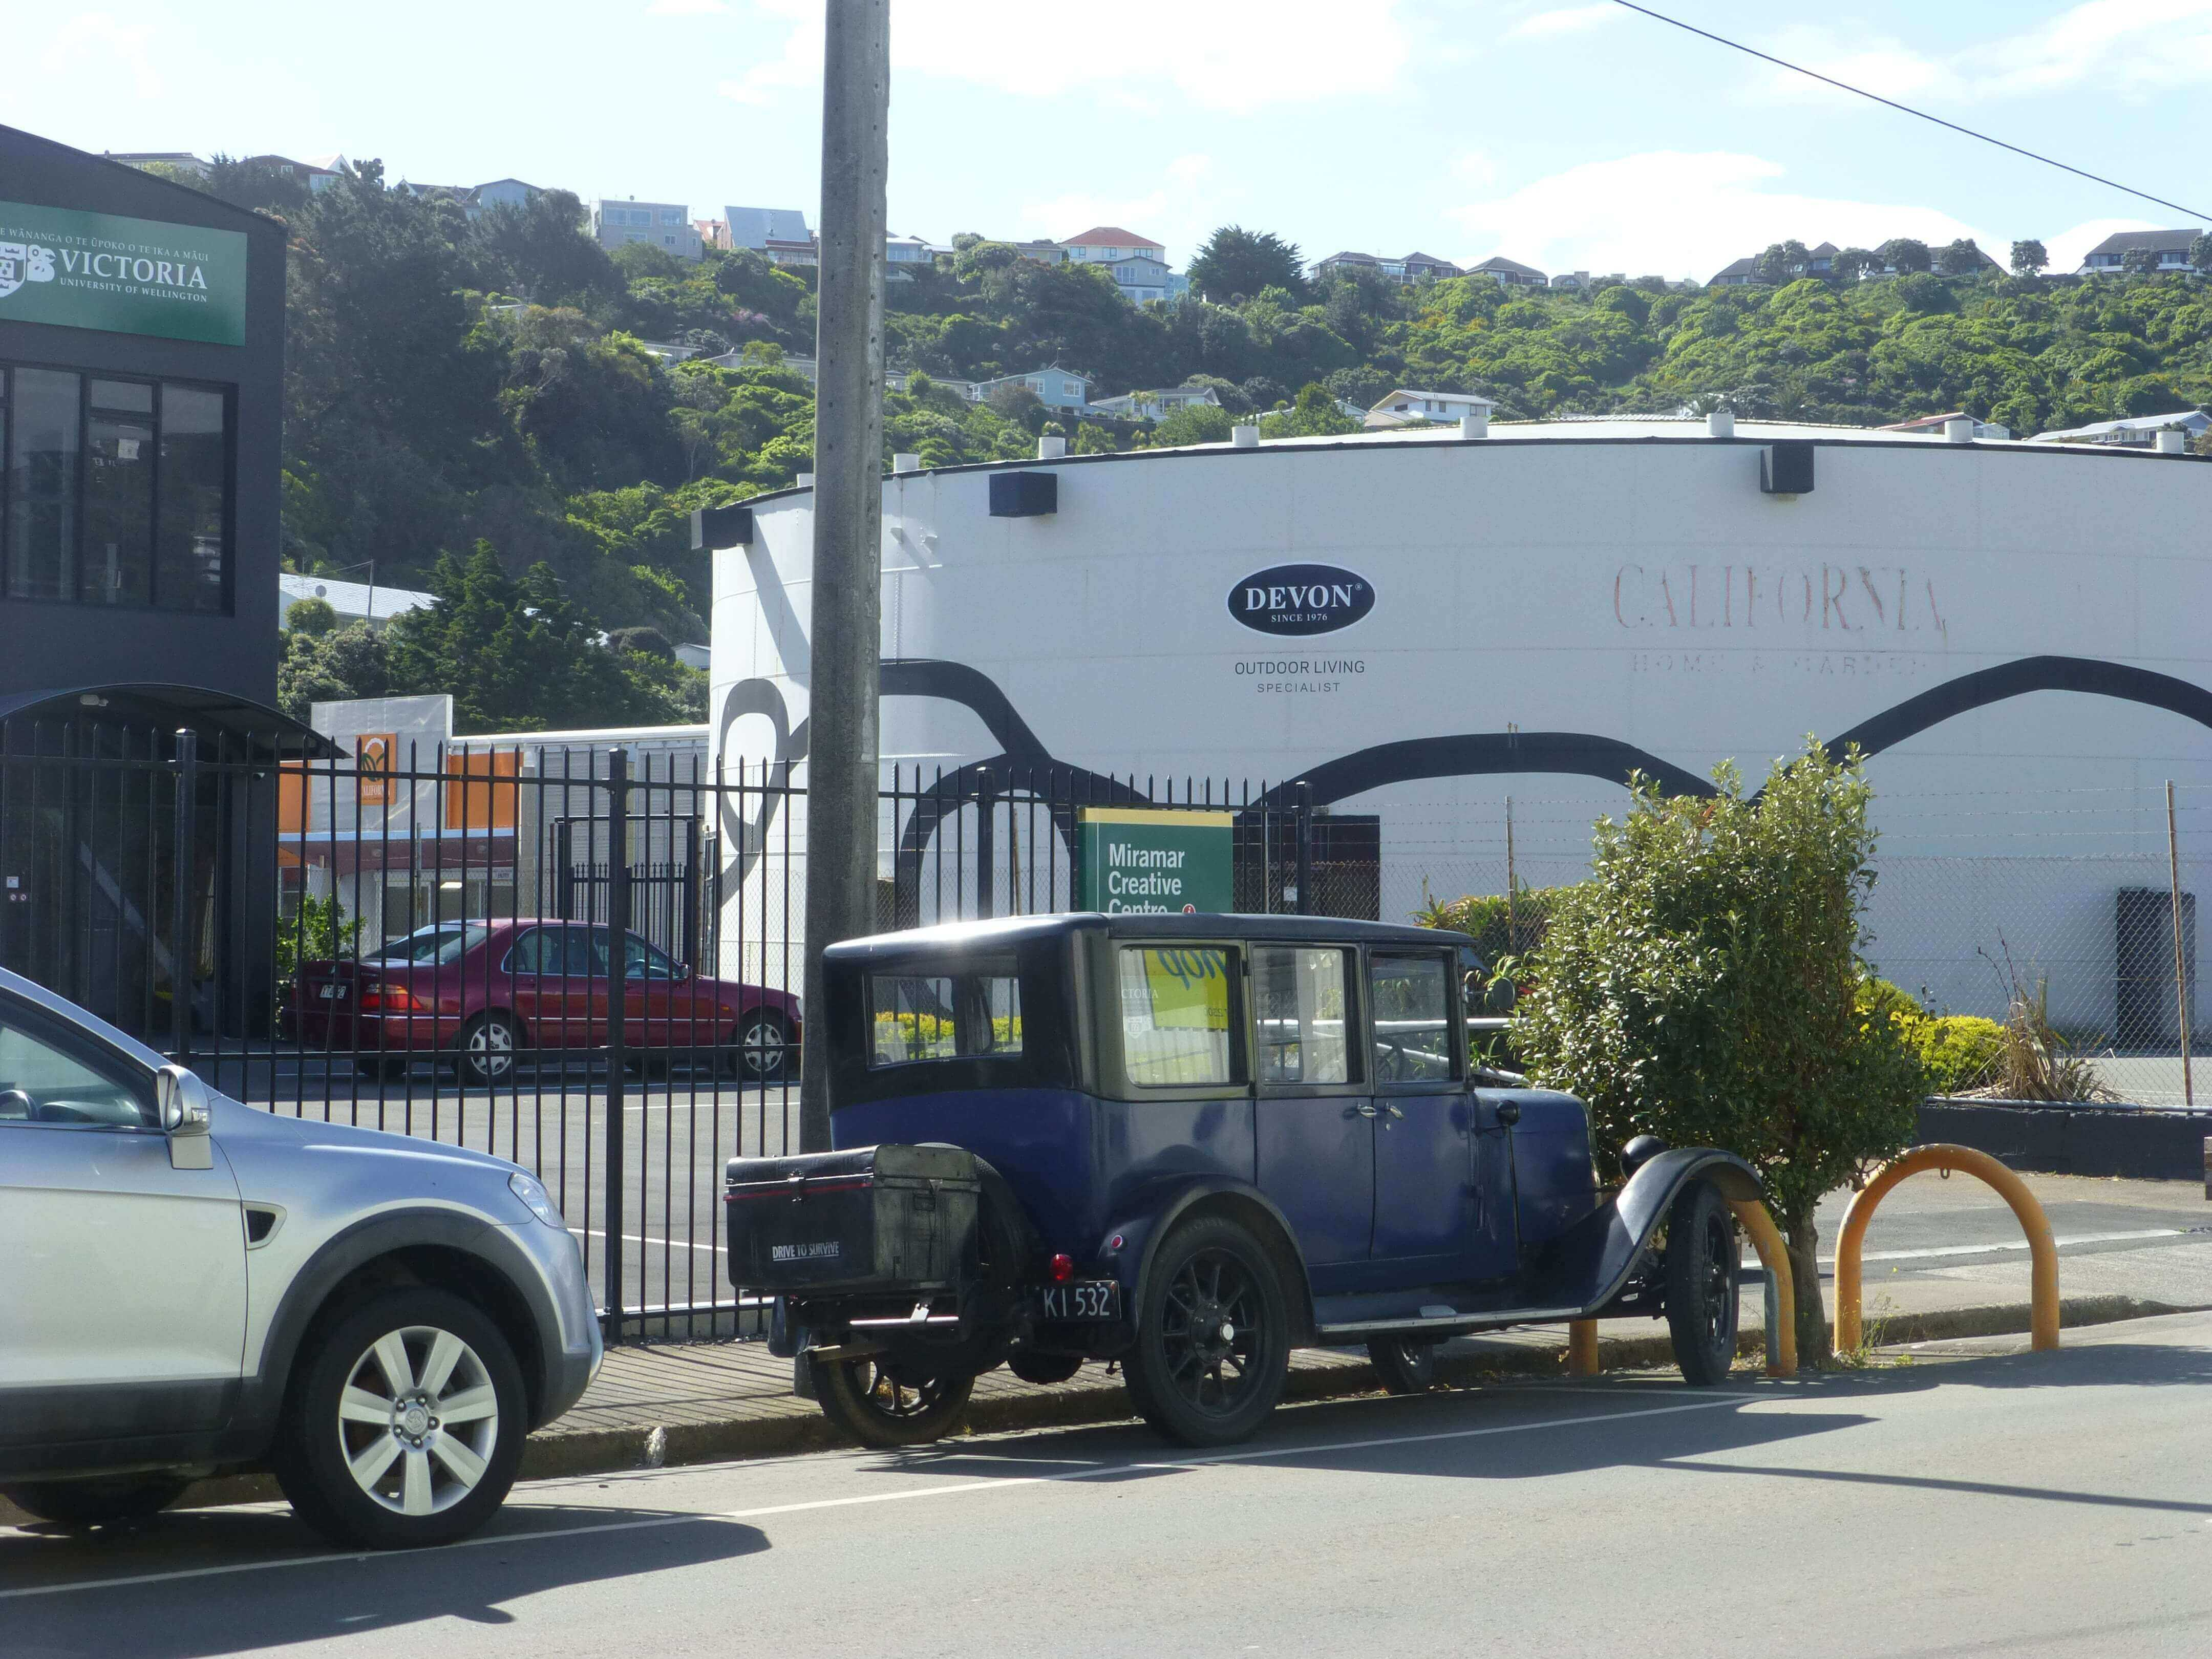 Wellington, in Miramar auf dem Weg zum Weta Shop, Weit-weg.reisen 16